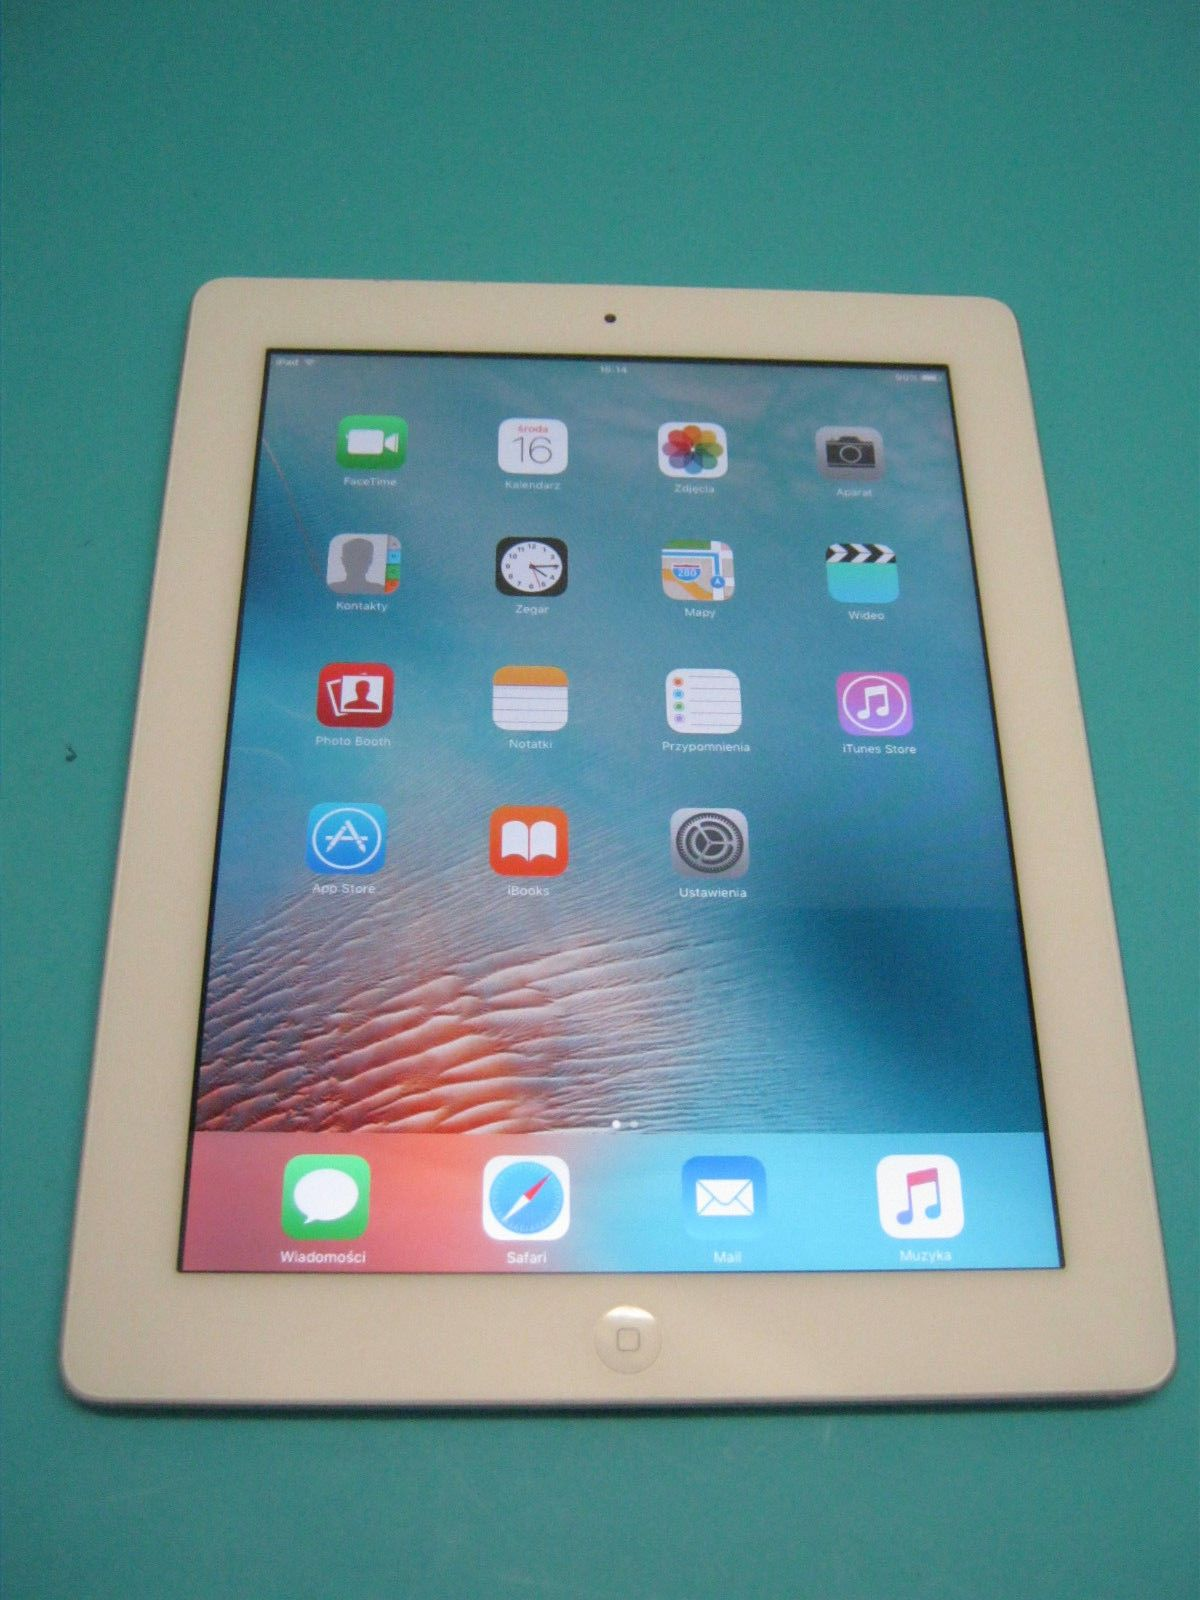 Apple iPad 2 A1395 16GB White Wifi -Excellent MC979LL/A 2012 https://t.co/LIgsiMA5KX https://t.co/qyAPSJsTnQ